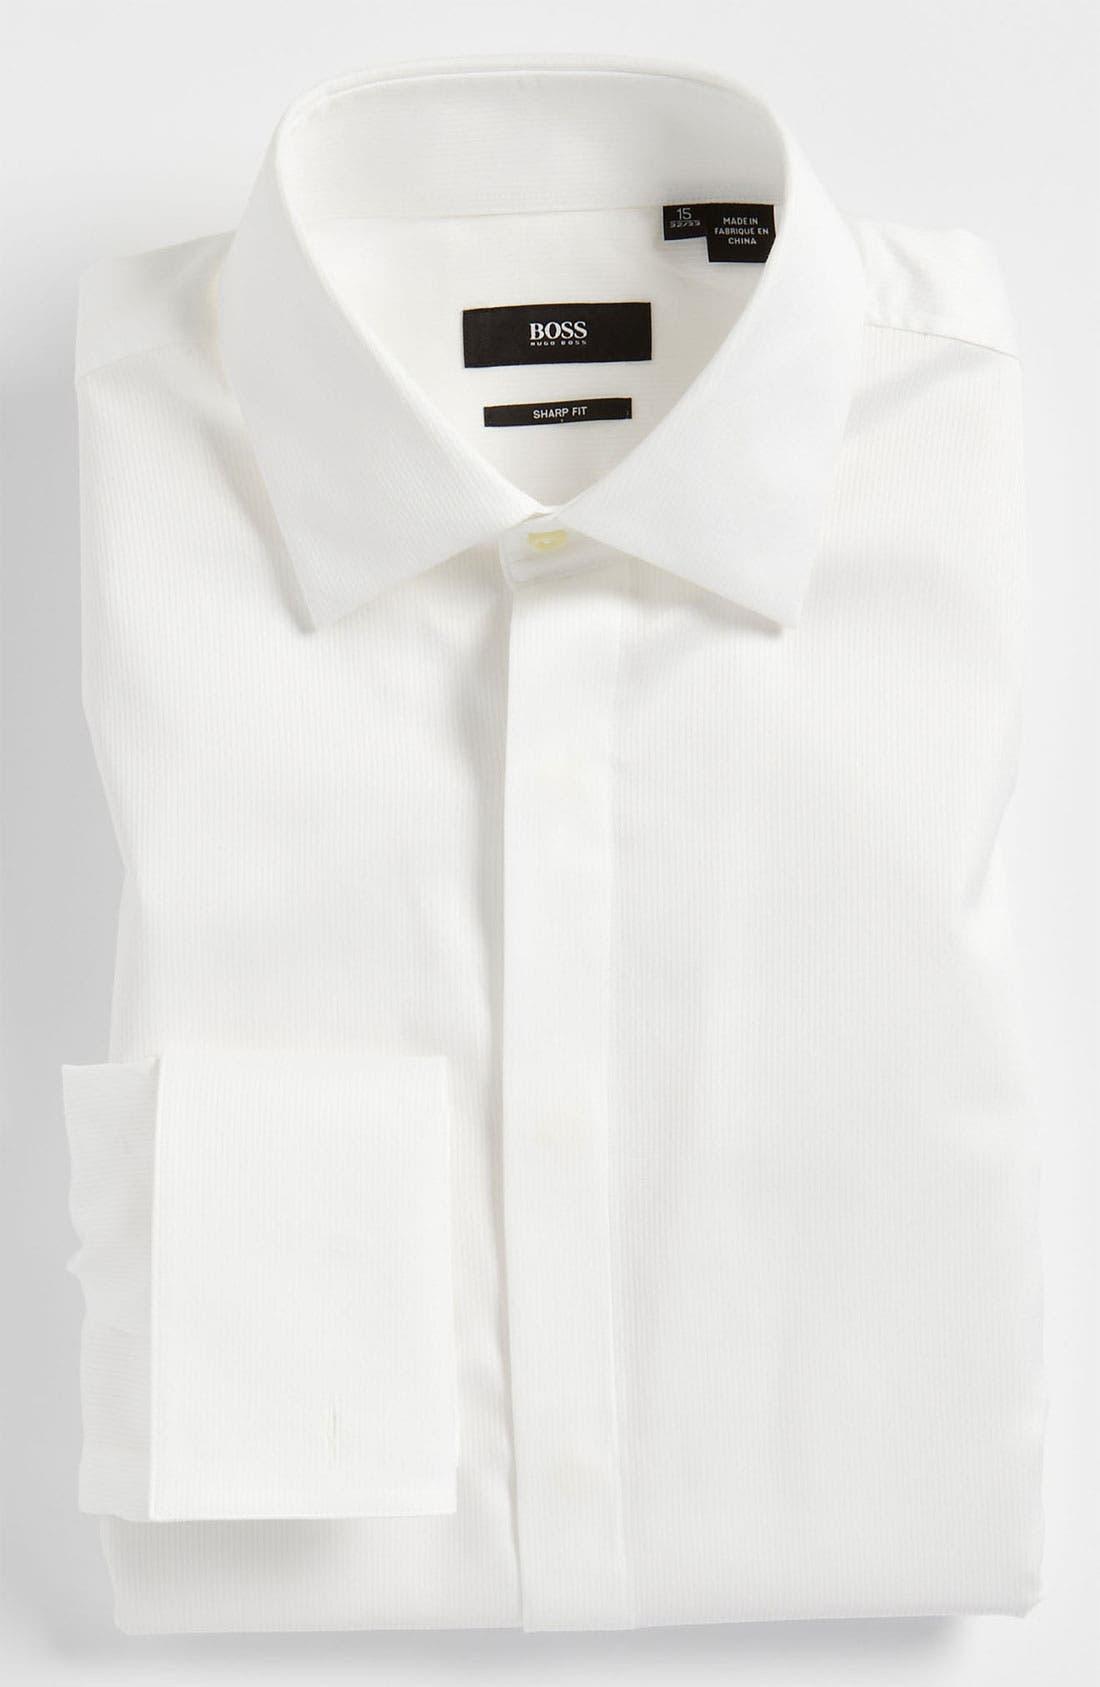 BOSS 'Marlyn' Sharp Fit Stripe French Cuff Tuxedo Shirt